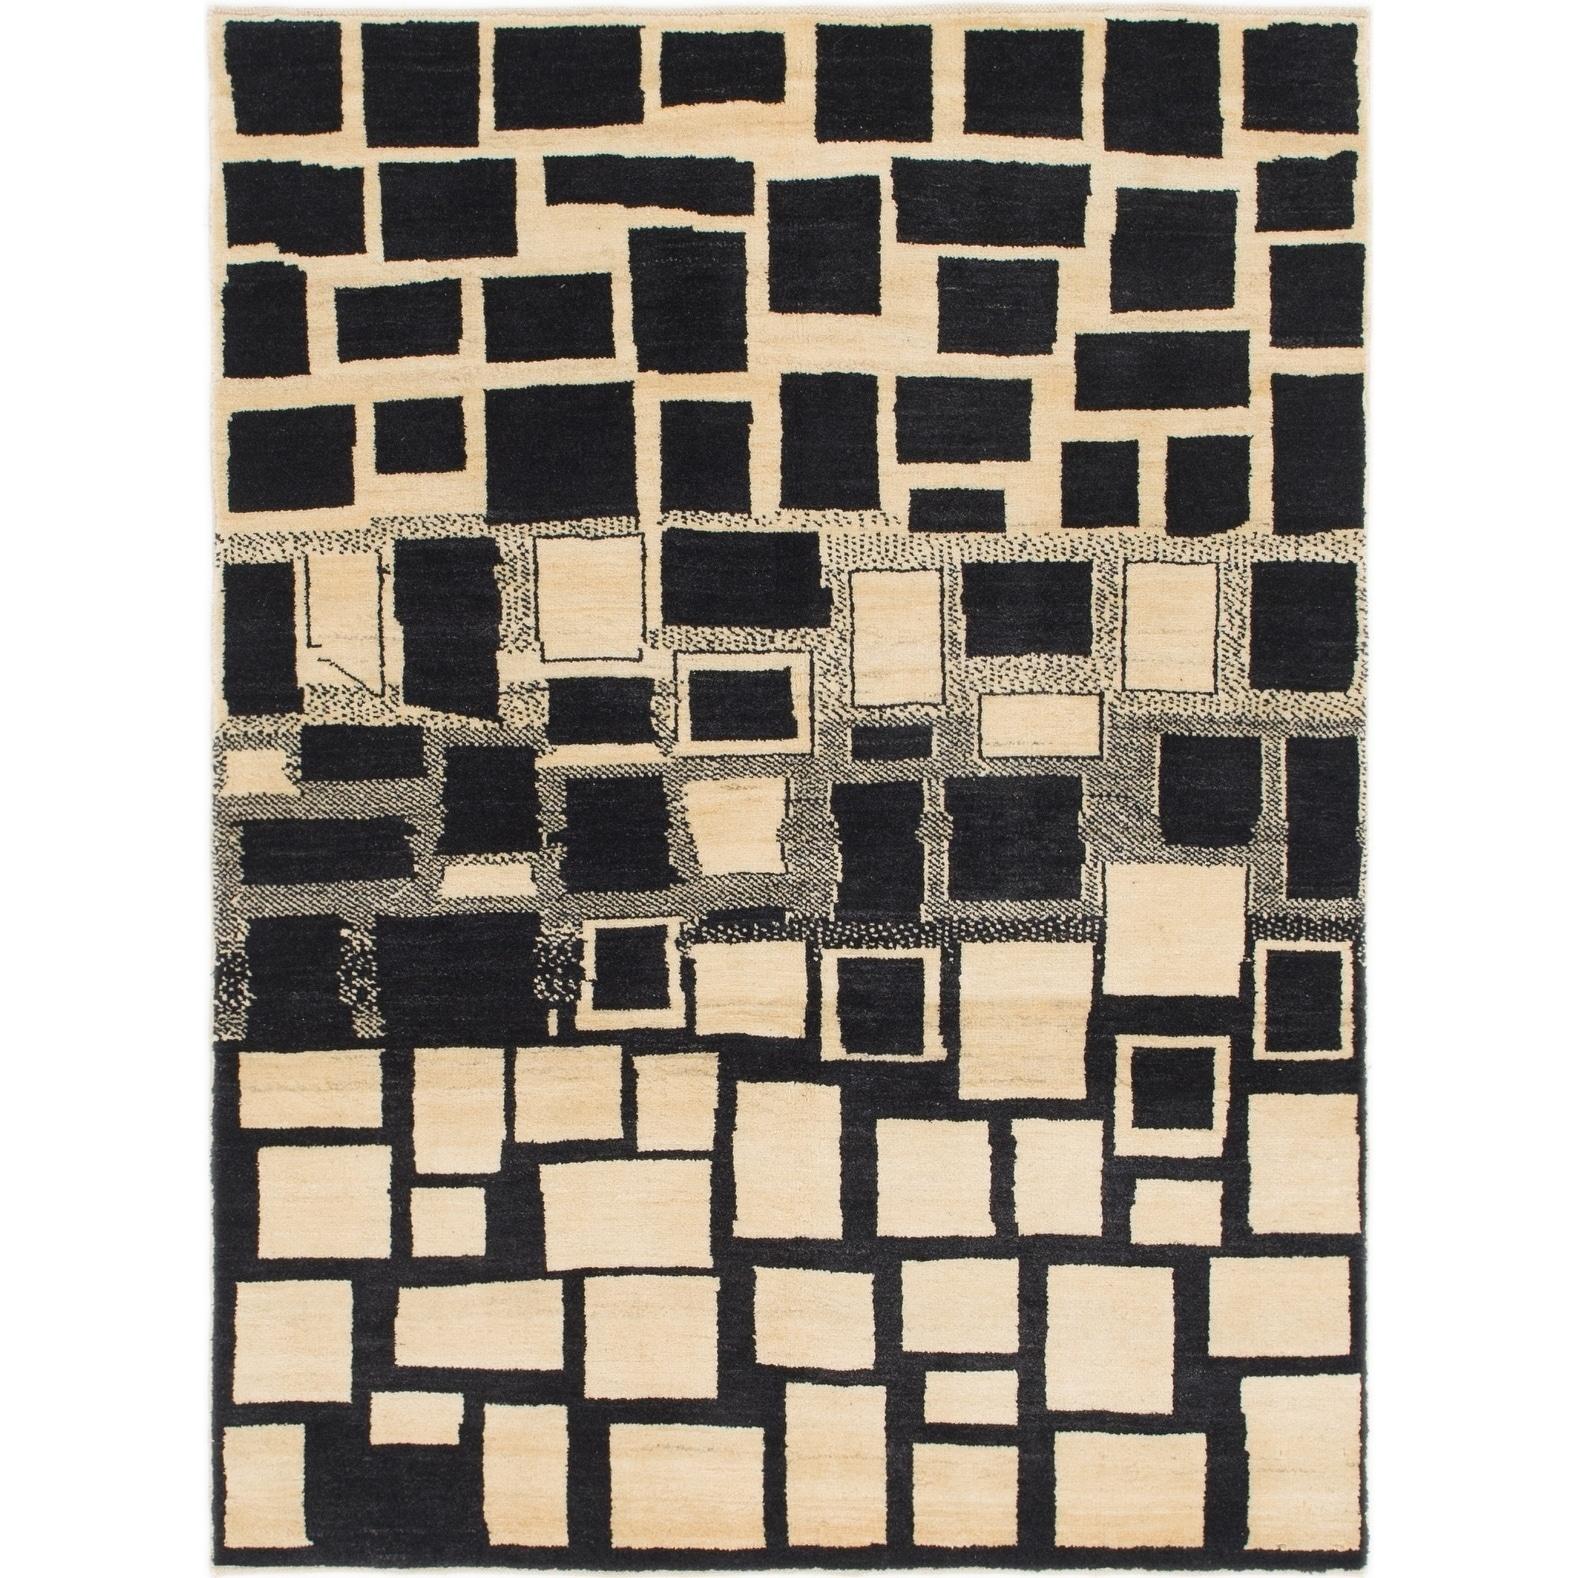 Hand Knotted Kashkuli Gabbeh Wool Area Rug - 4 8 x 6 4 (Black - 4 8 x 6 4)